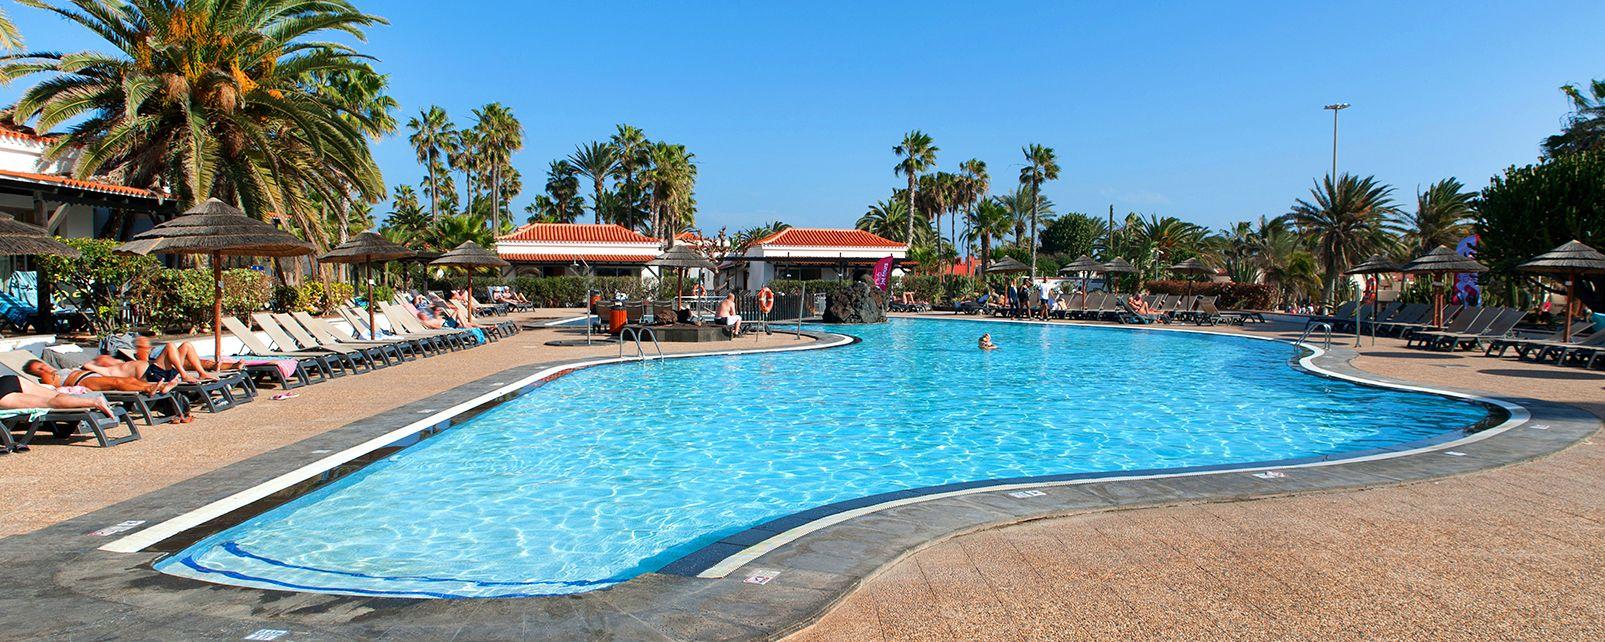 Club Jet tours Barcelo Castillo Beach